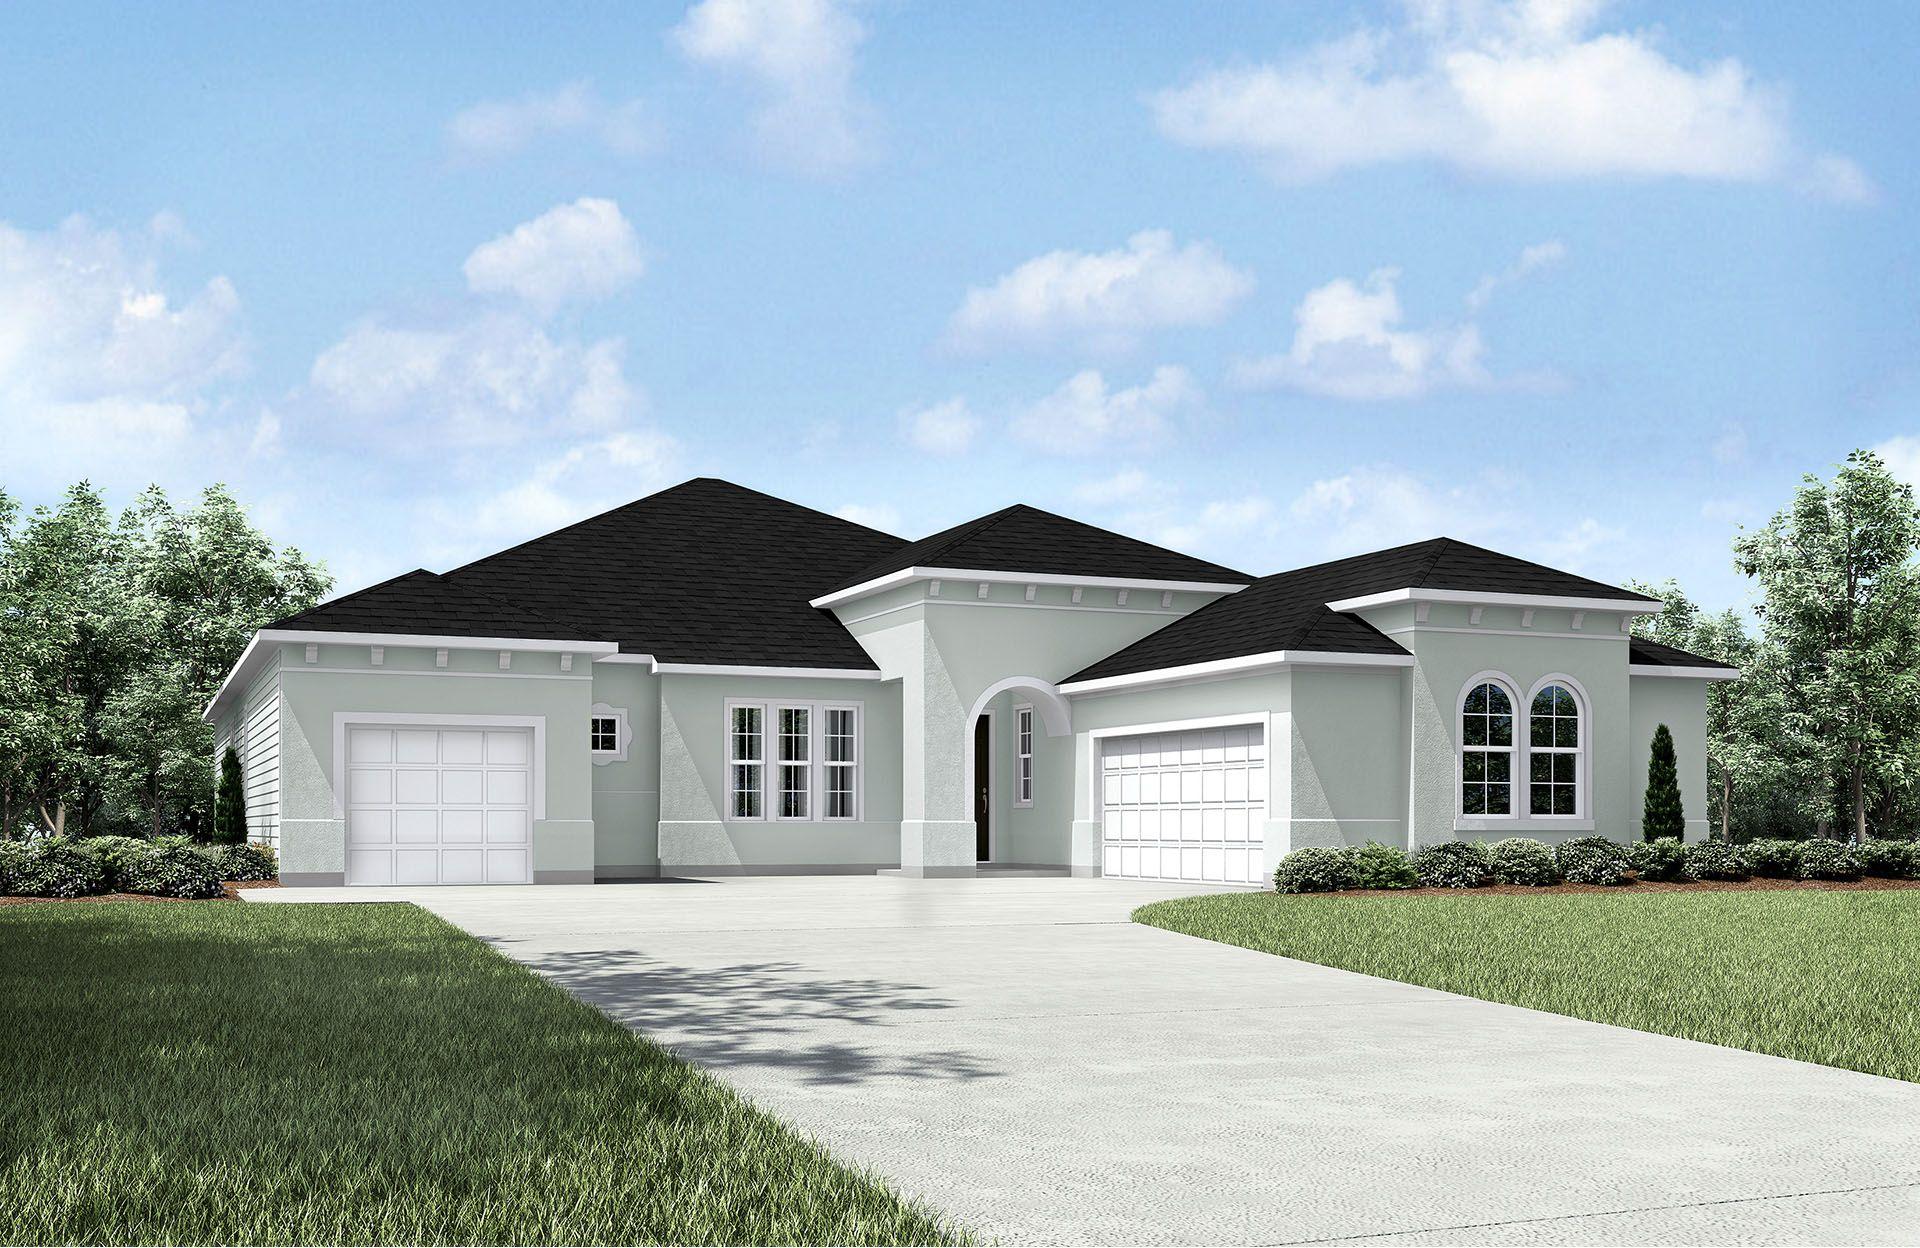 Single Family for Sale at Jacksonville Offsite - Radford Jacksonville, Florida 32257 United States